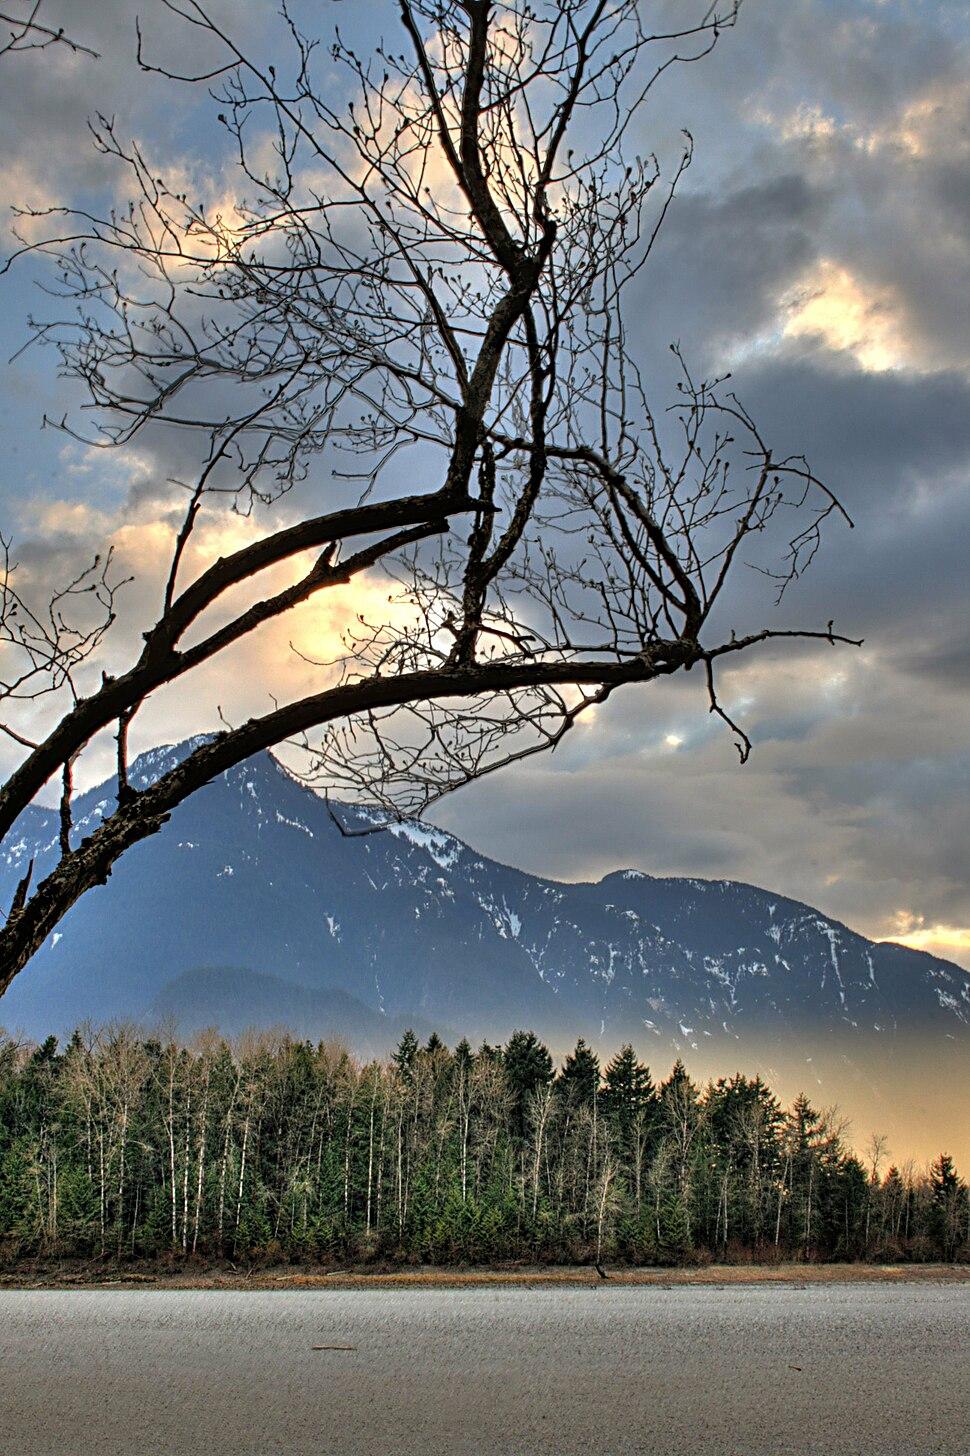 Tree Hope British Columbia Canada 03A